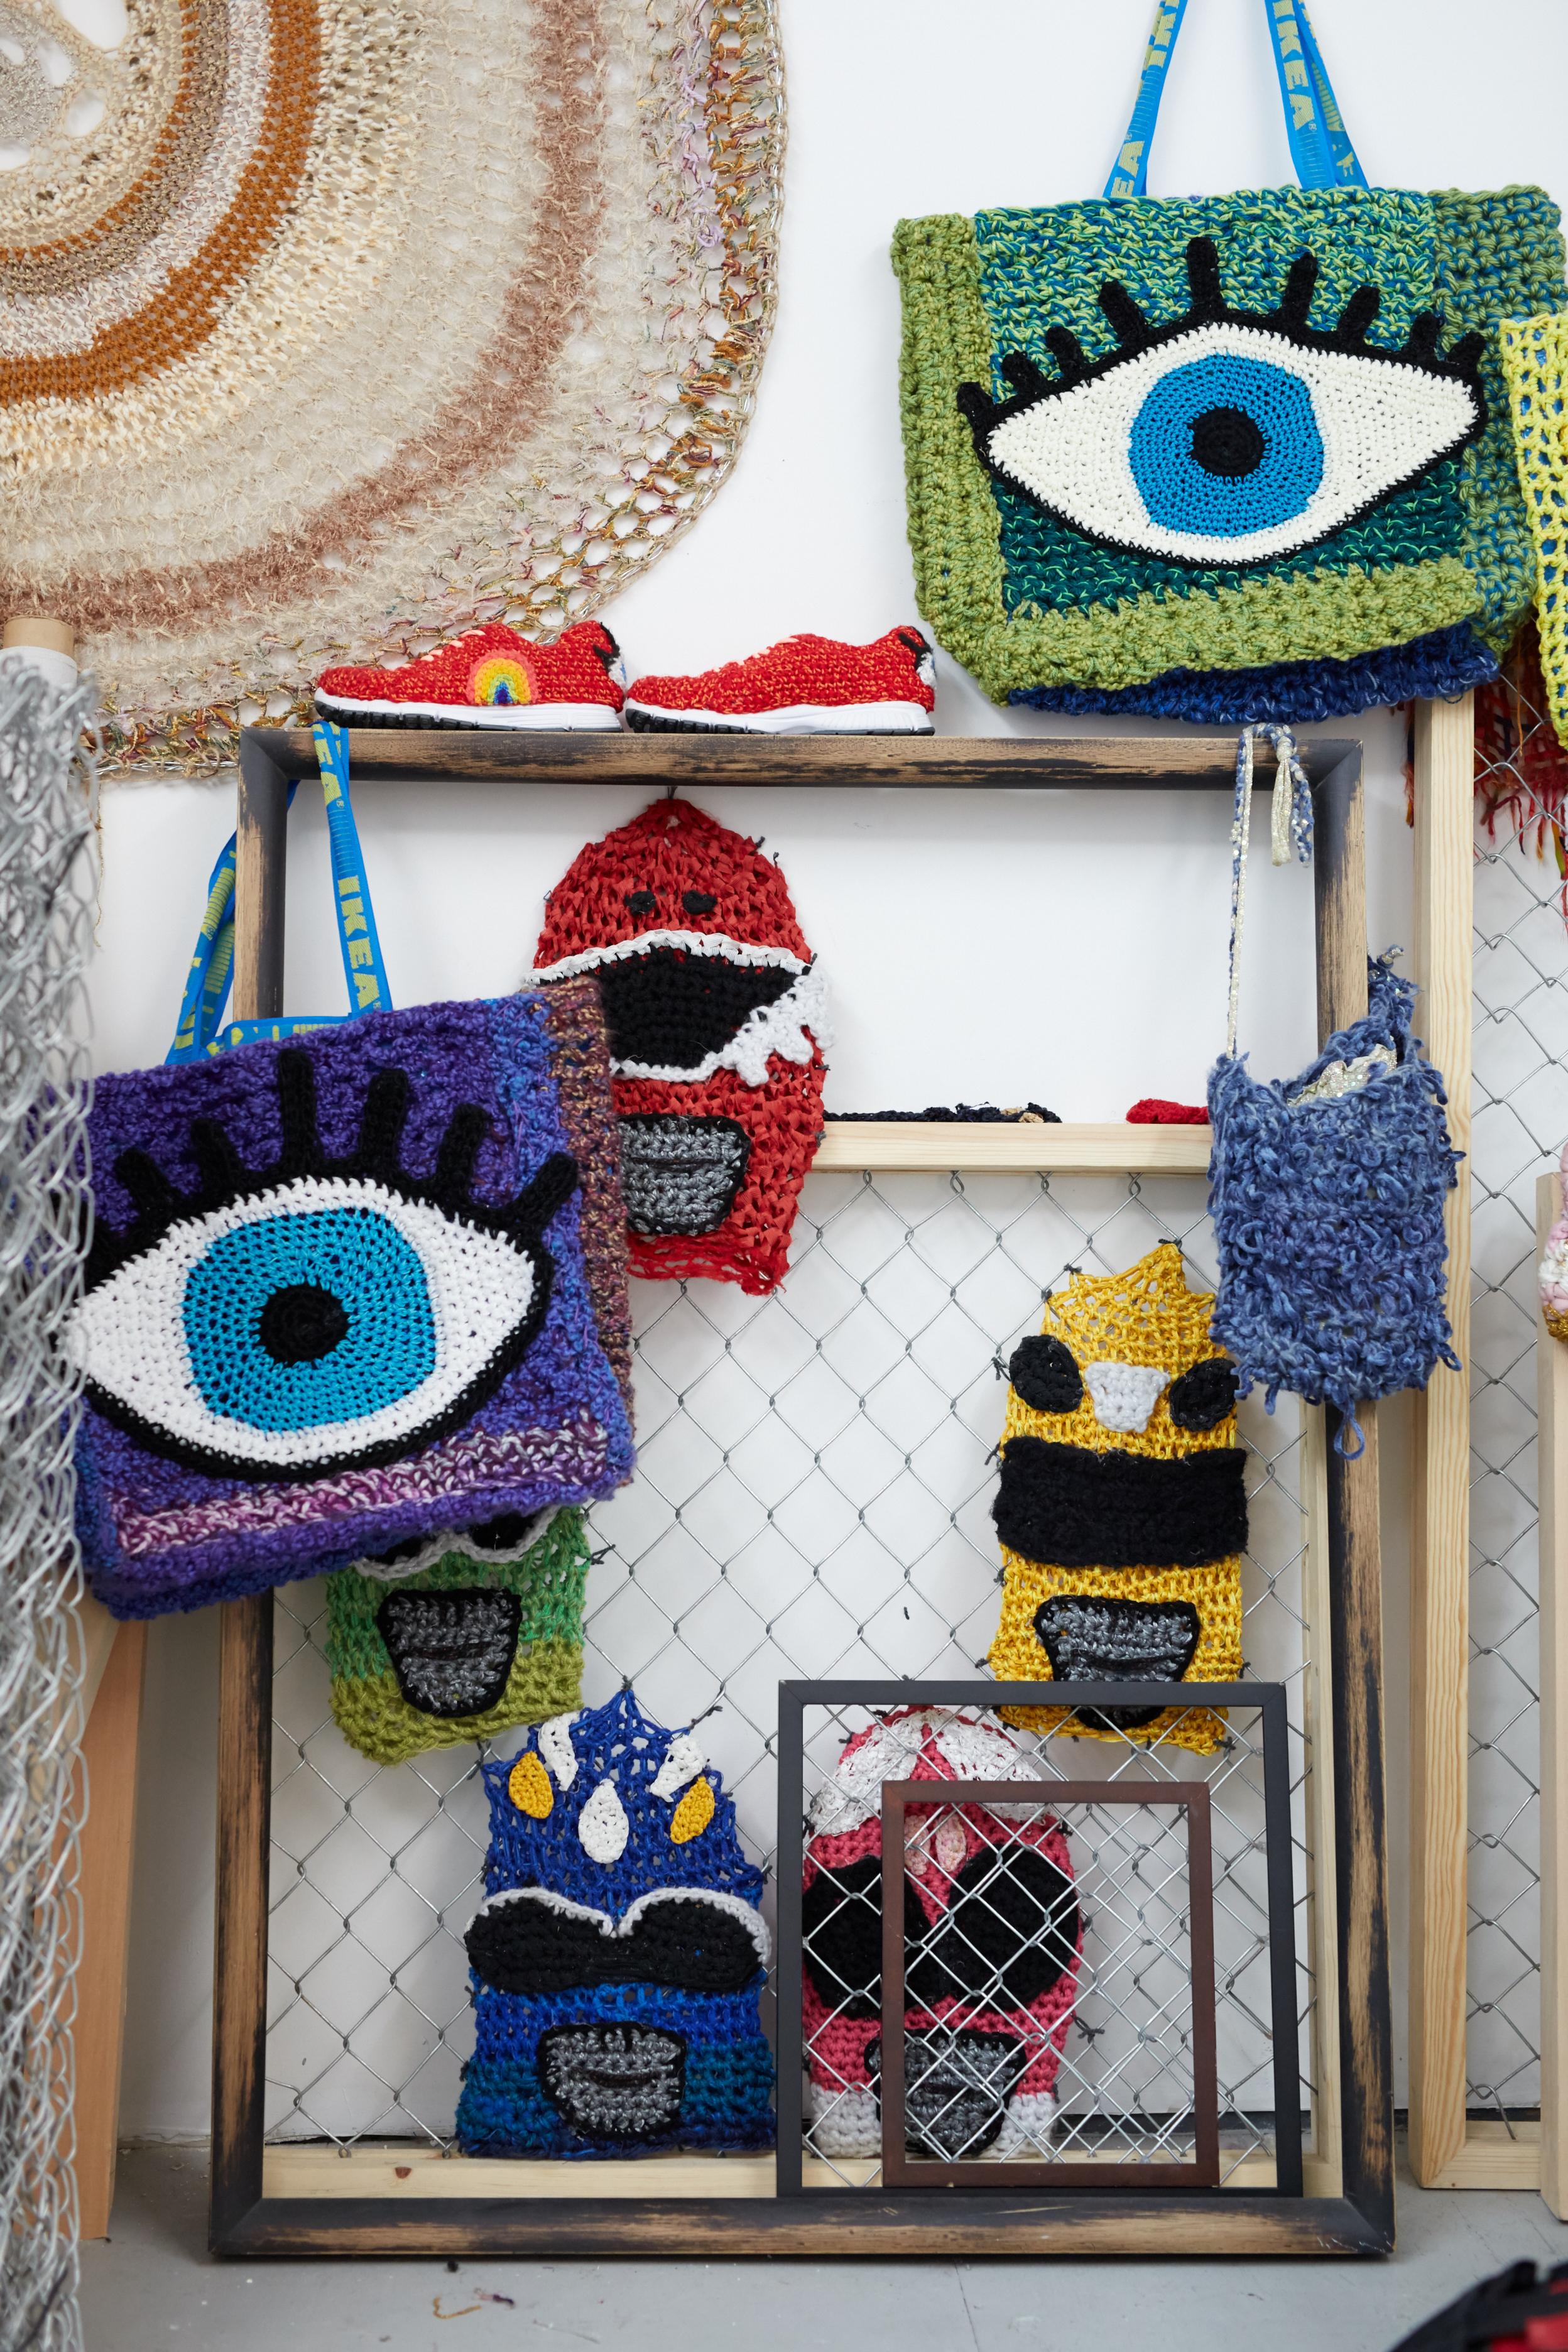 London's studio of yarn bombings.